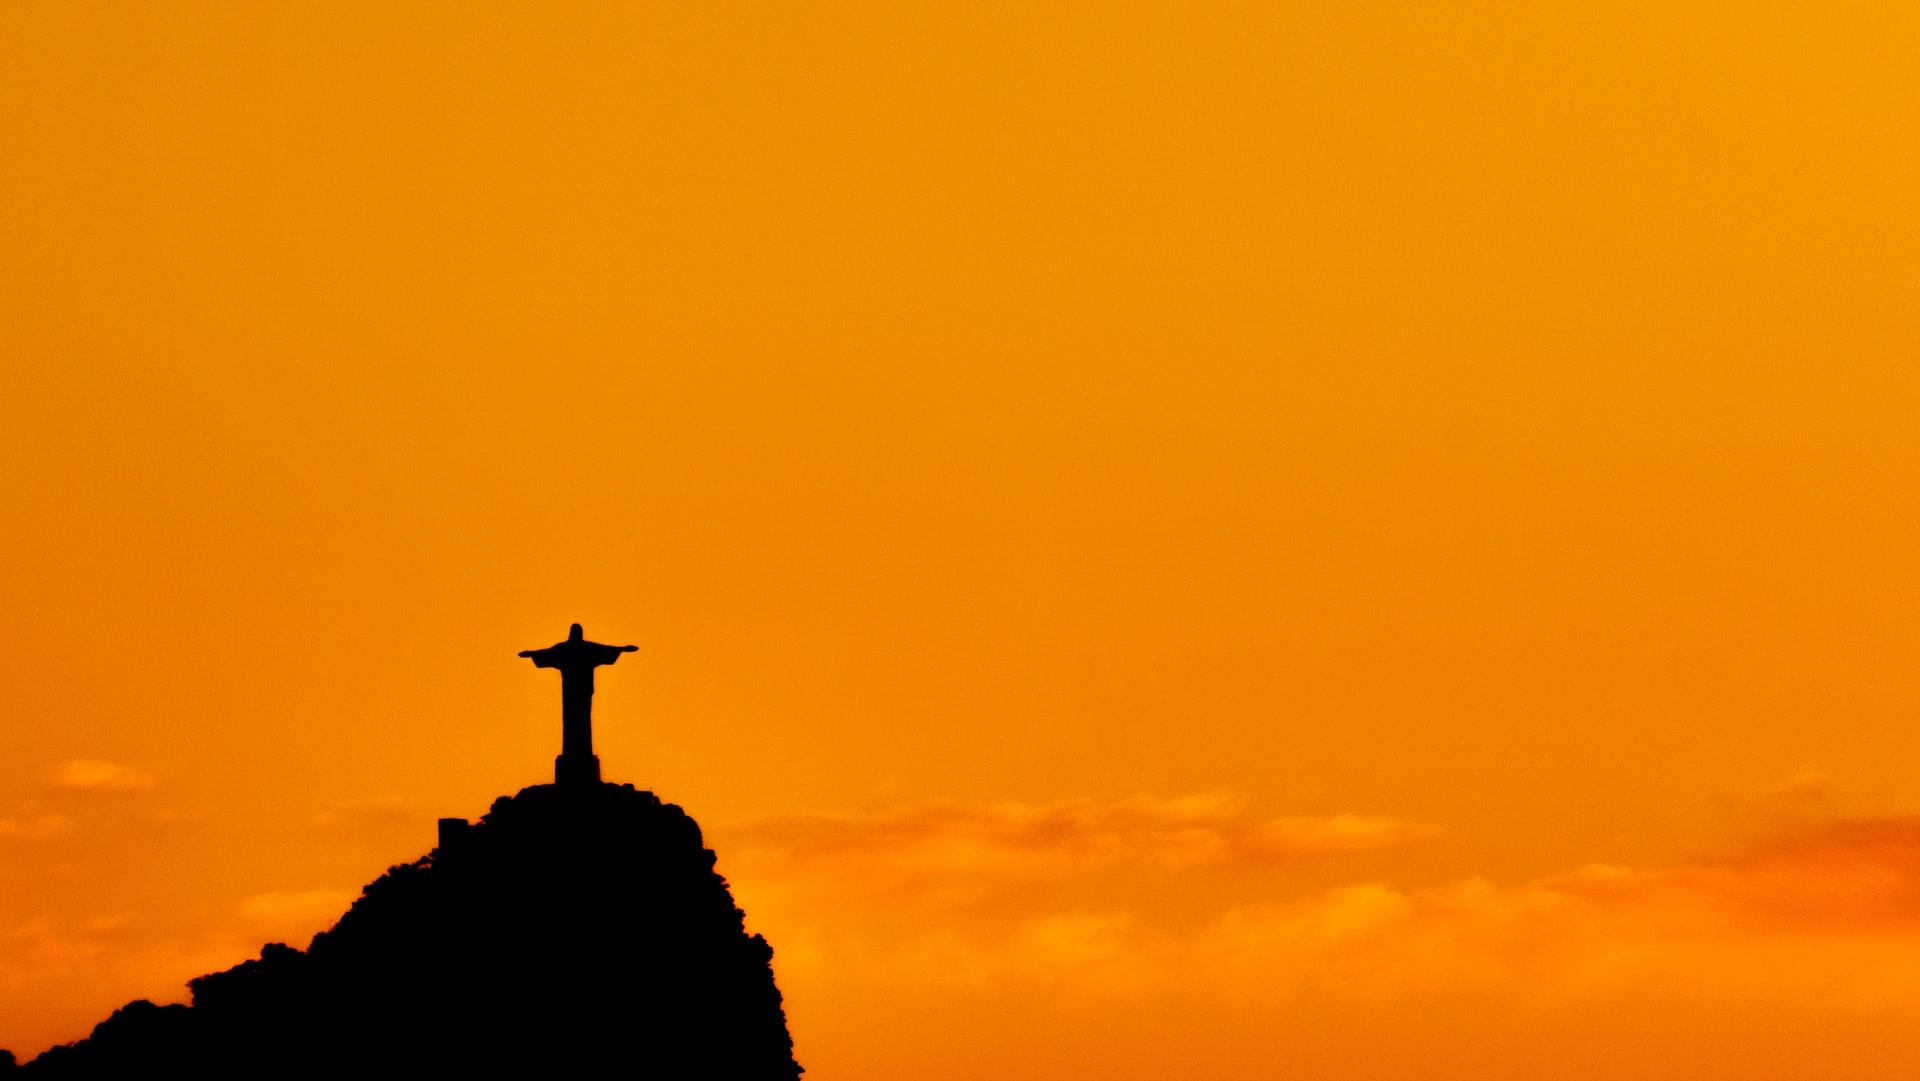 Brasil: gigante bancario BTG Pactual lanza plataforma para invertir en Bitcoin y Ethereum